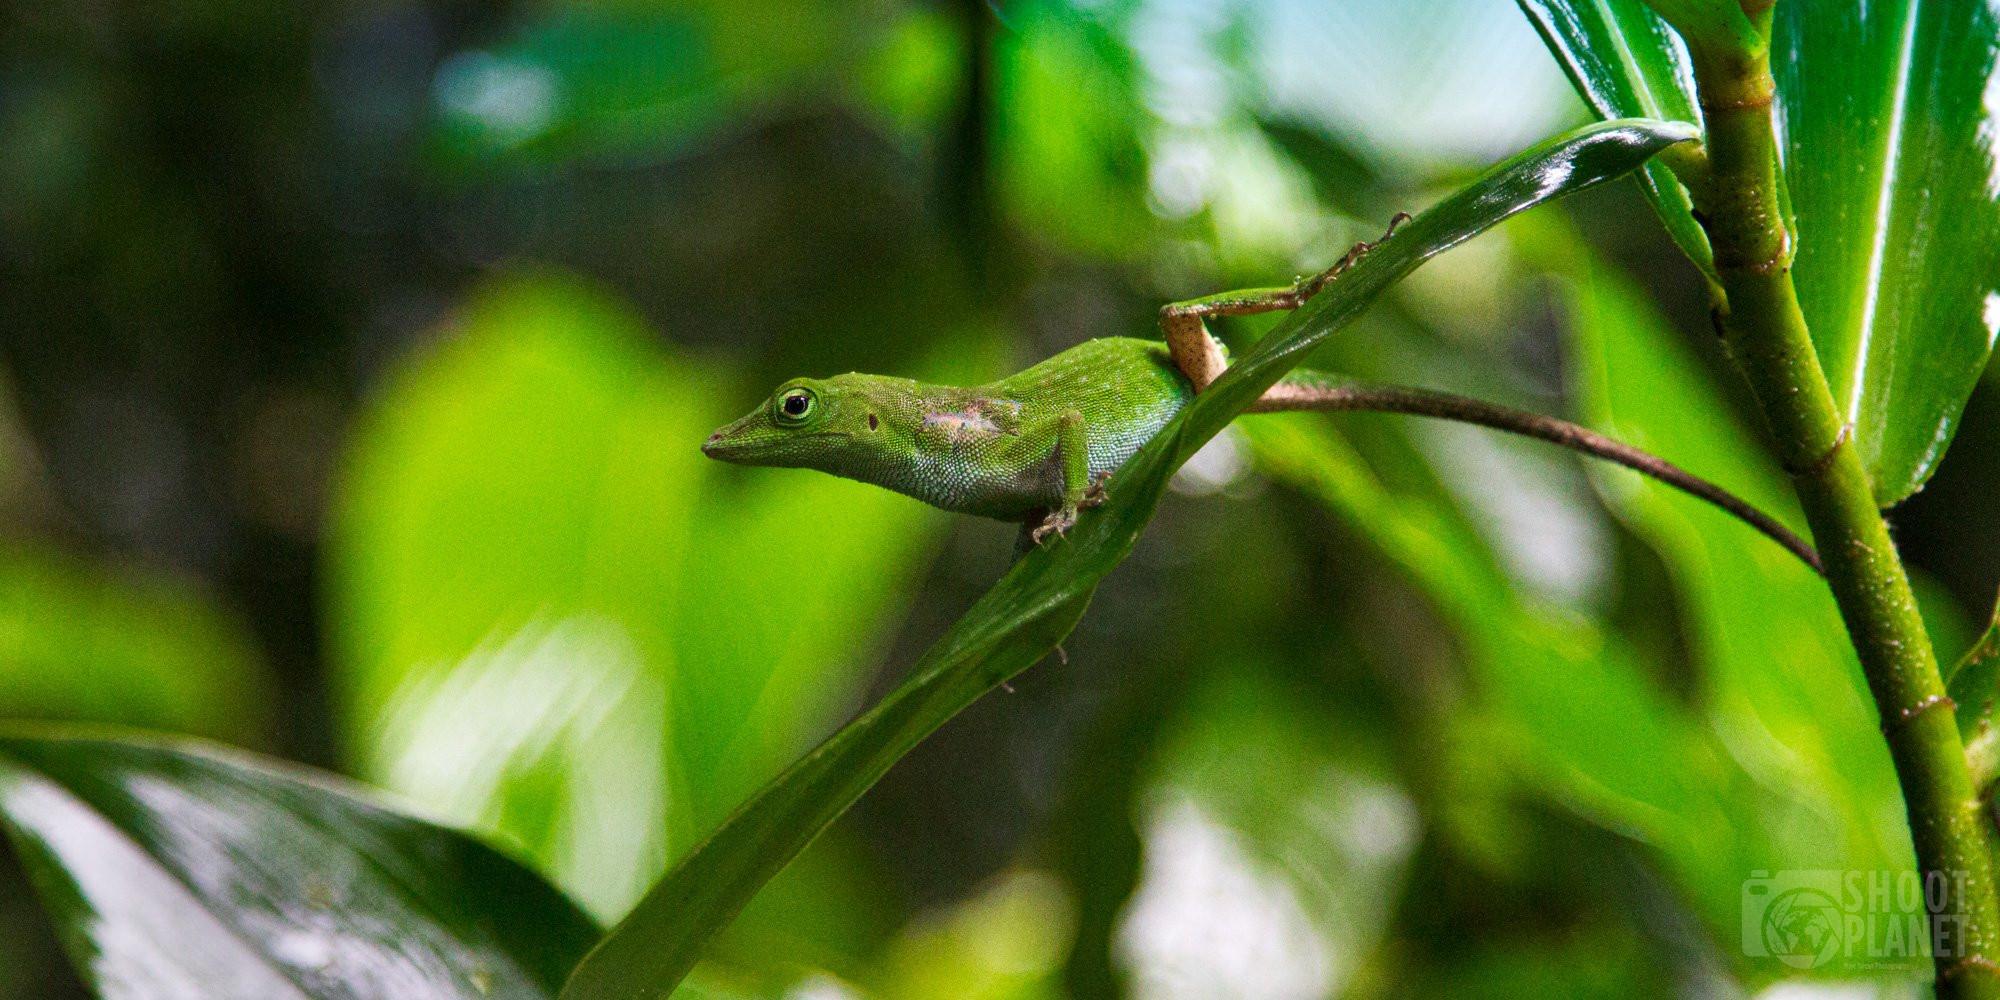 Green spiny lizard, Manuel Antonio, Costa Rica